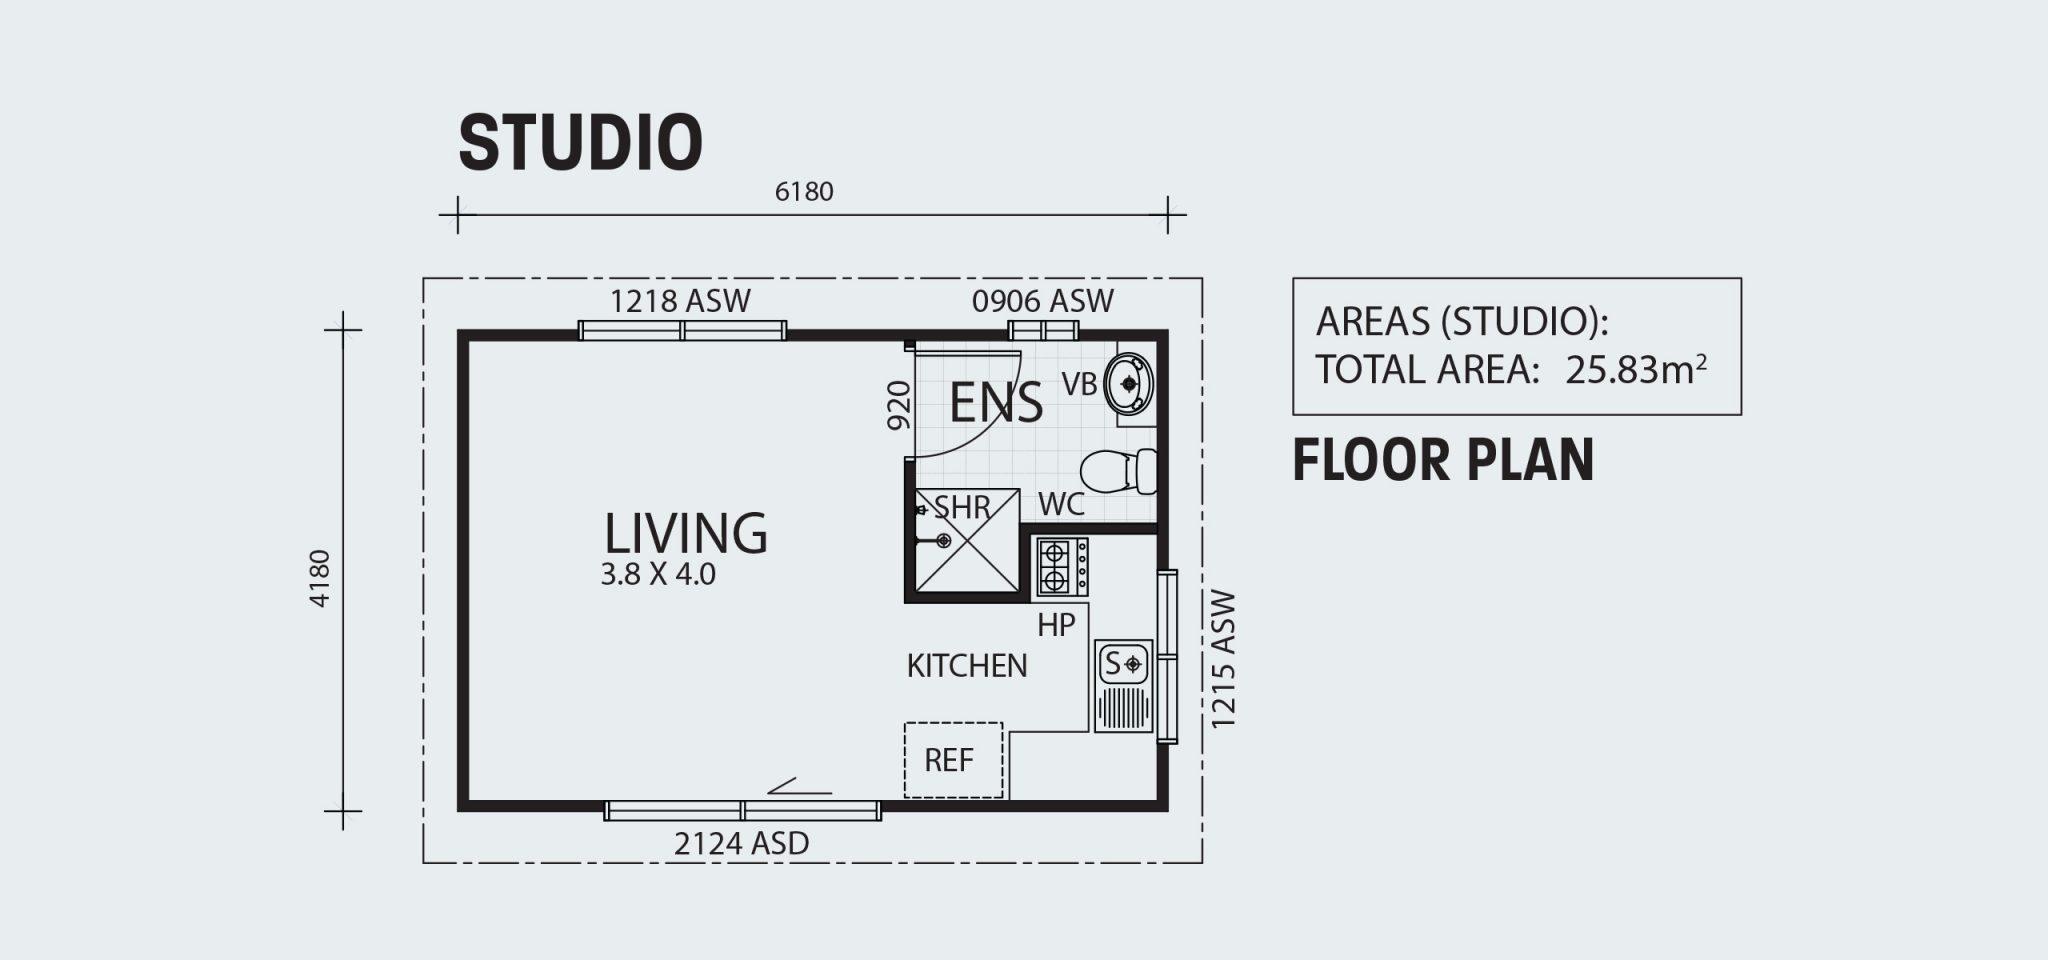 Studio R25 Floorplan